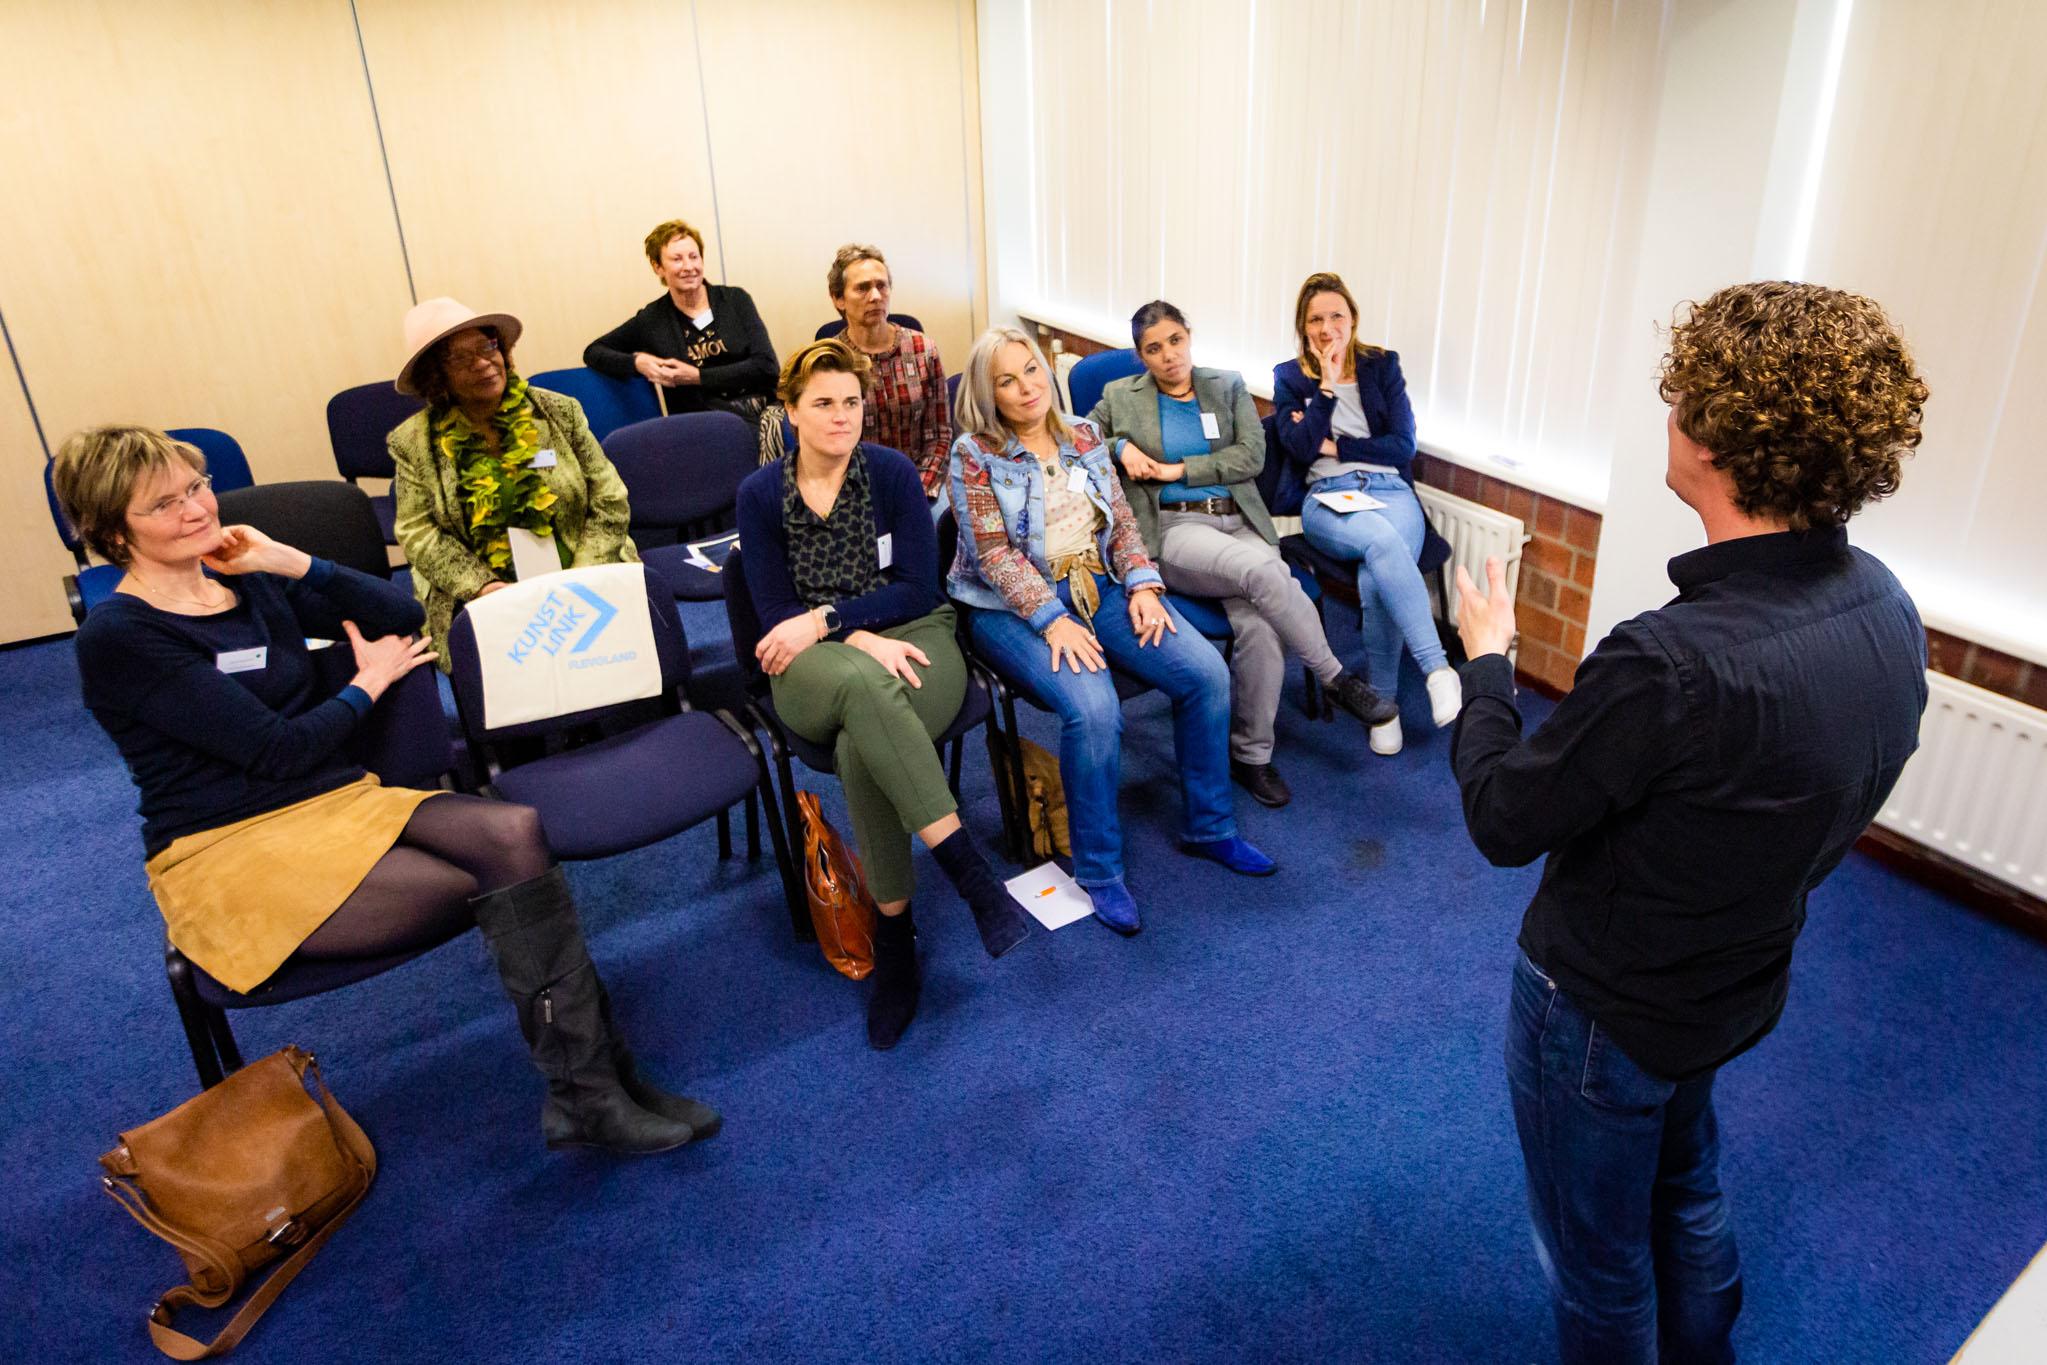 Bedrijf Reportage Positieve Gezondheid Flevoland Shot By Sylla 47